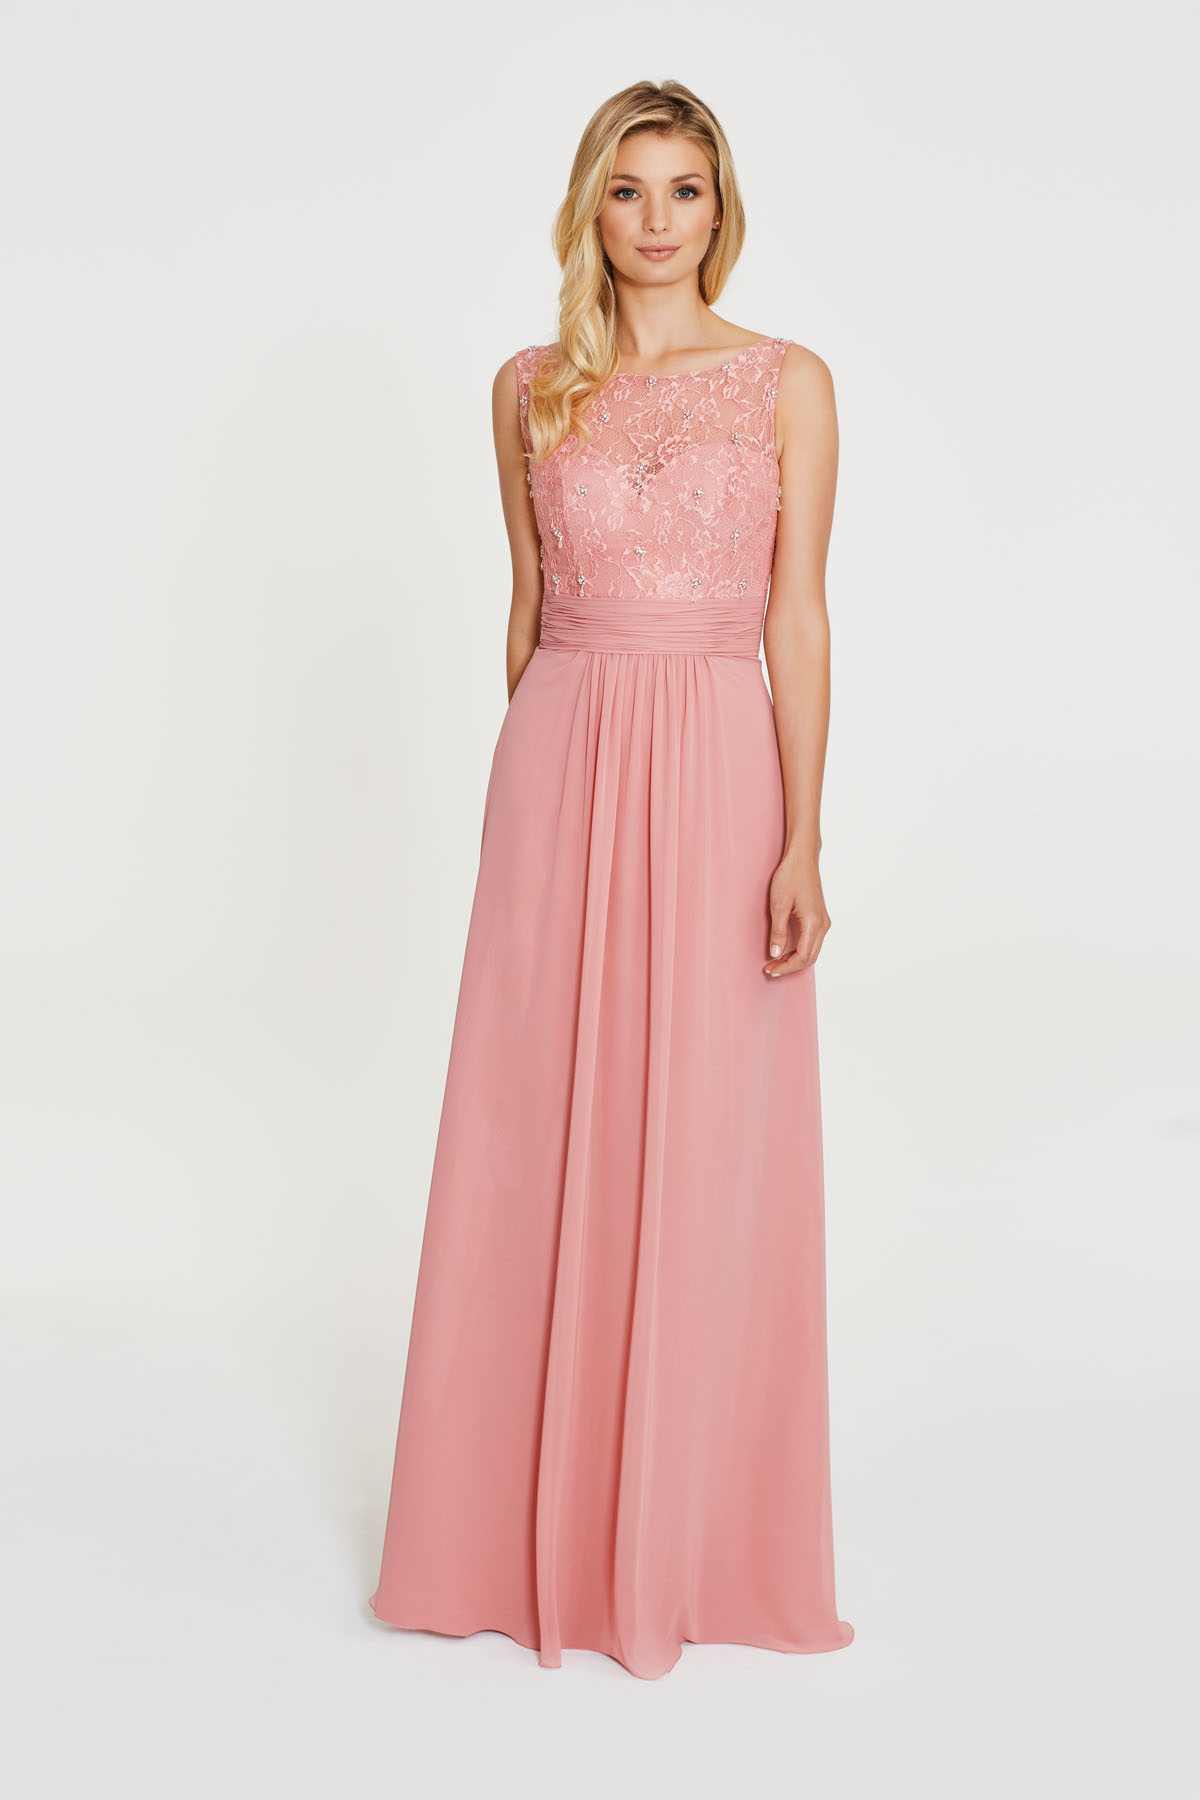 Bridesmaid Dresses by Ebony Rose, Romantique Bridal